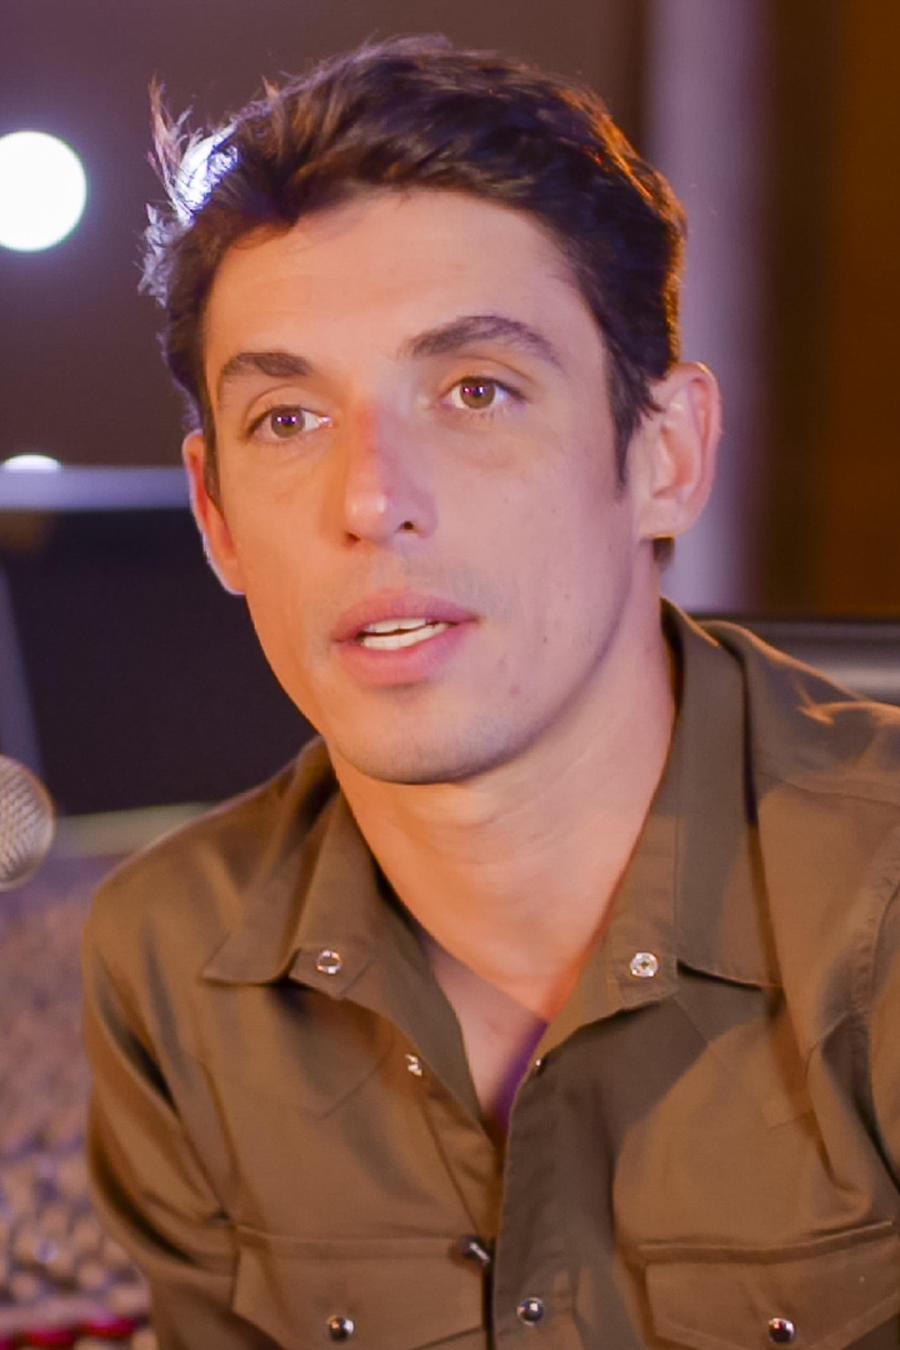 Alberto Guerra